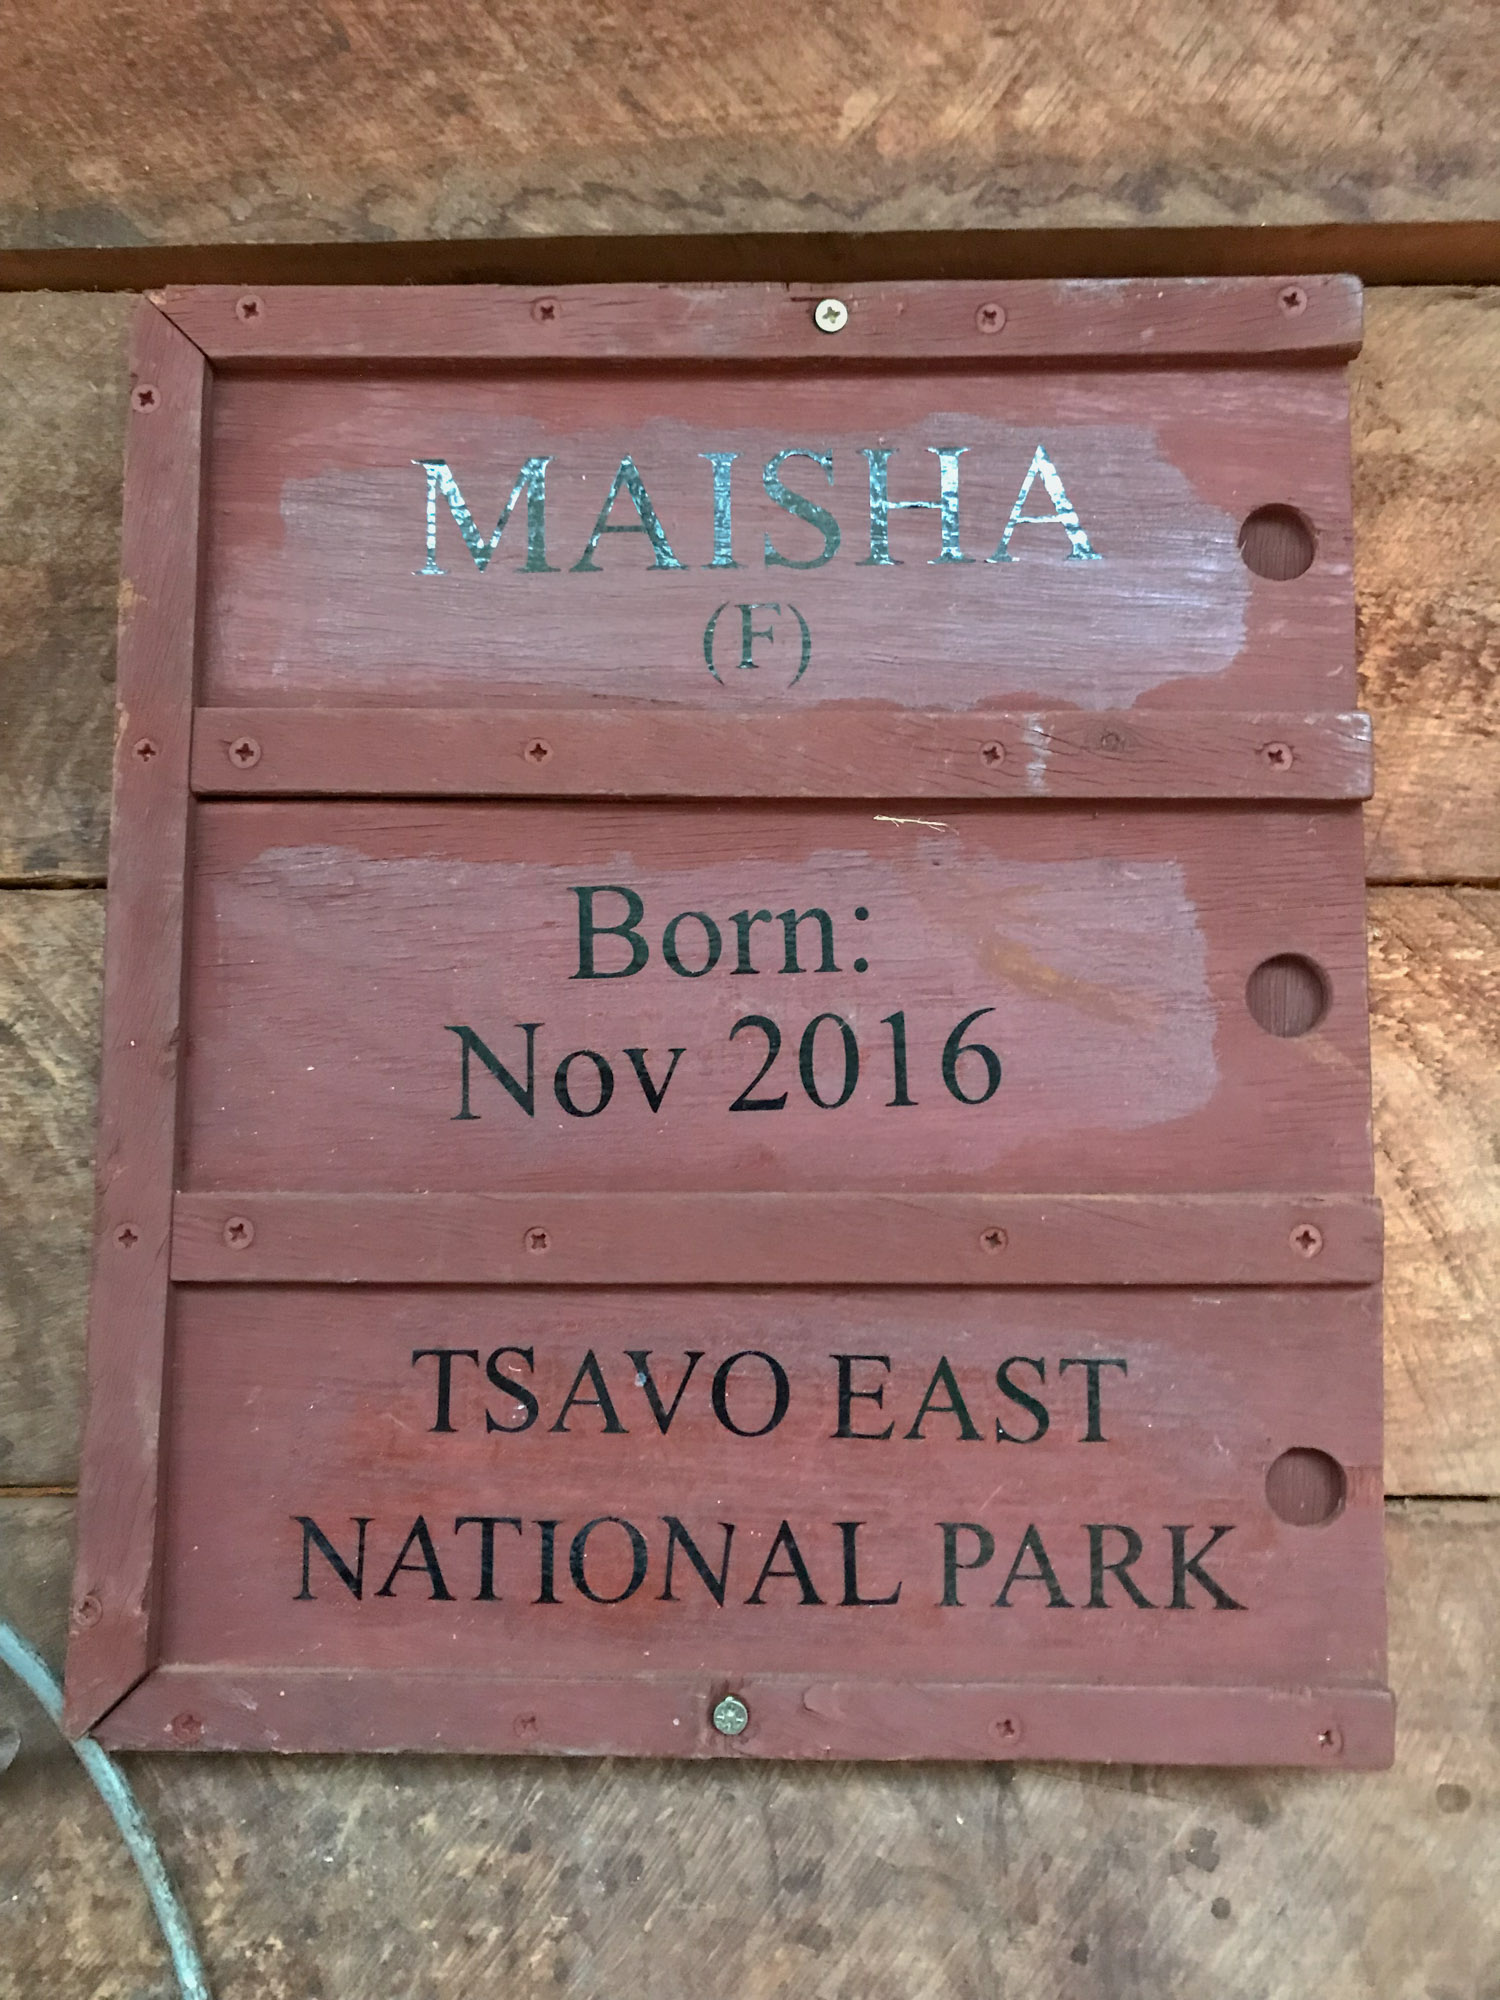 Maisha's stable sign